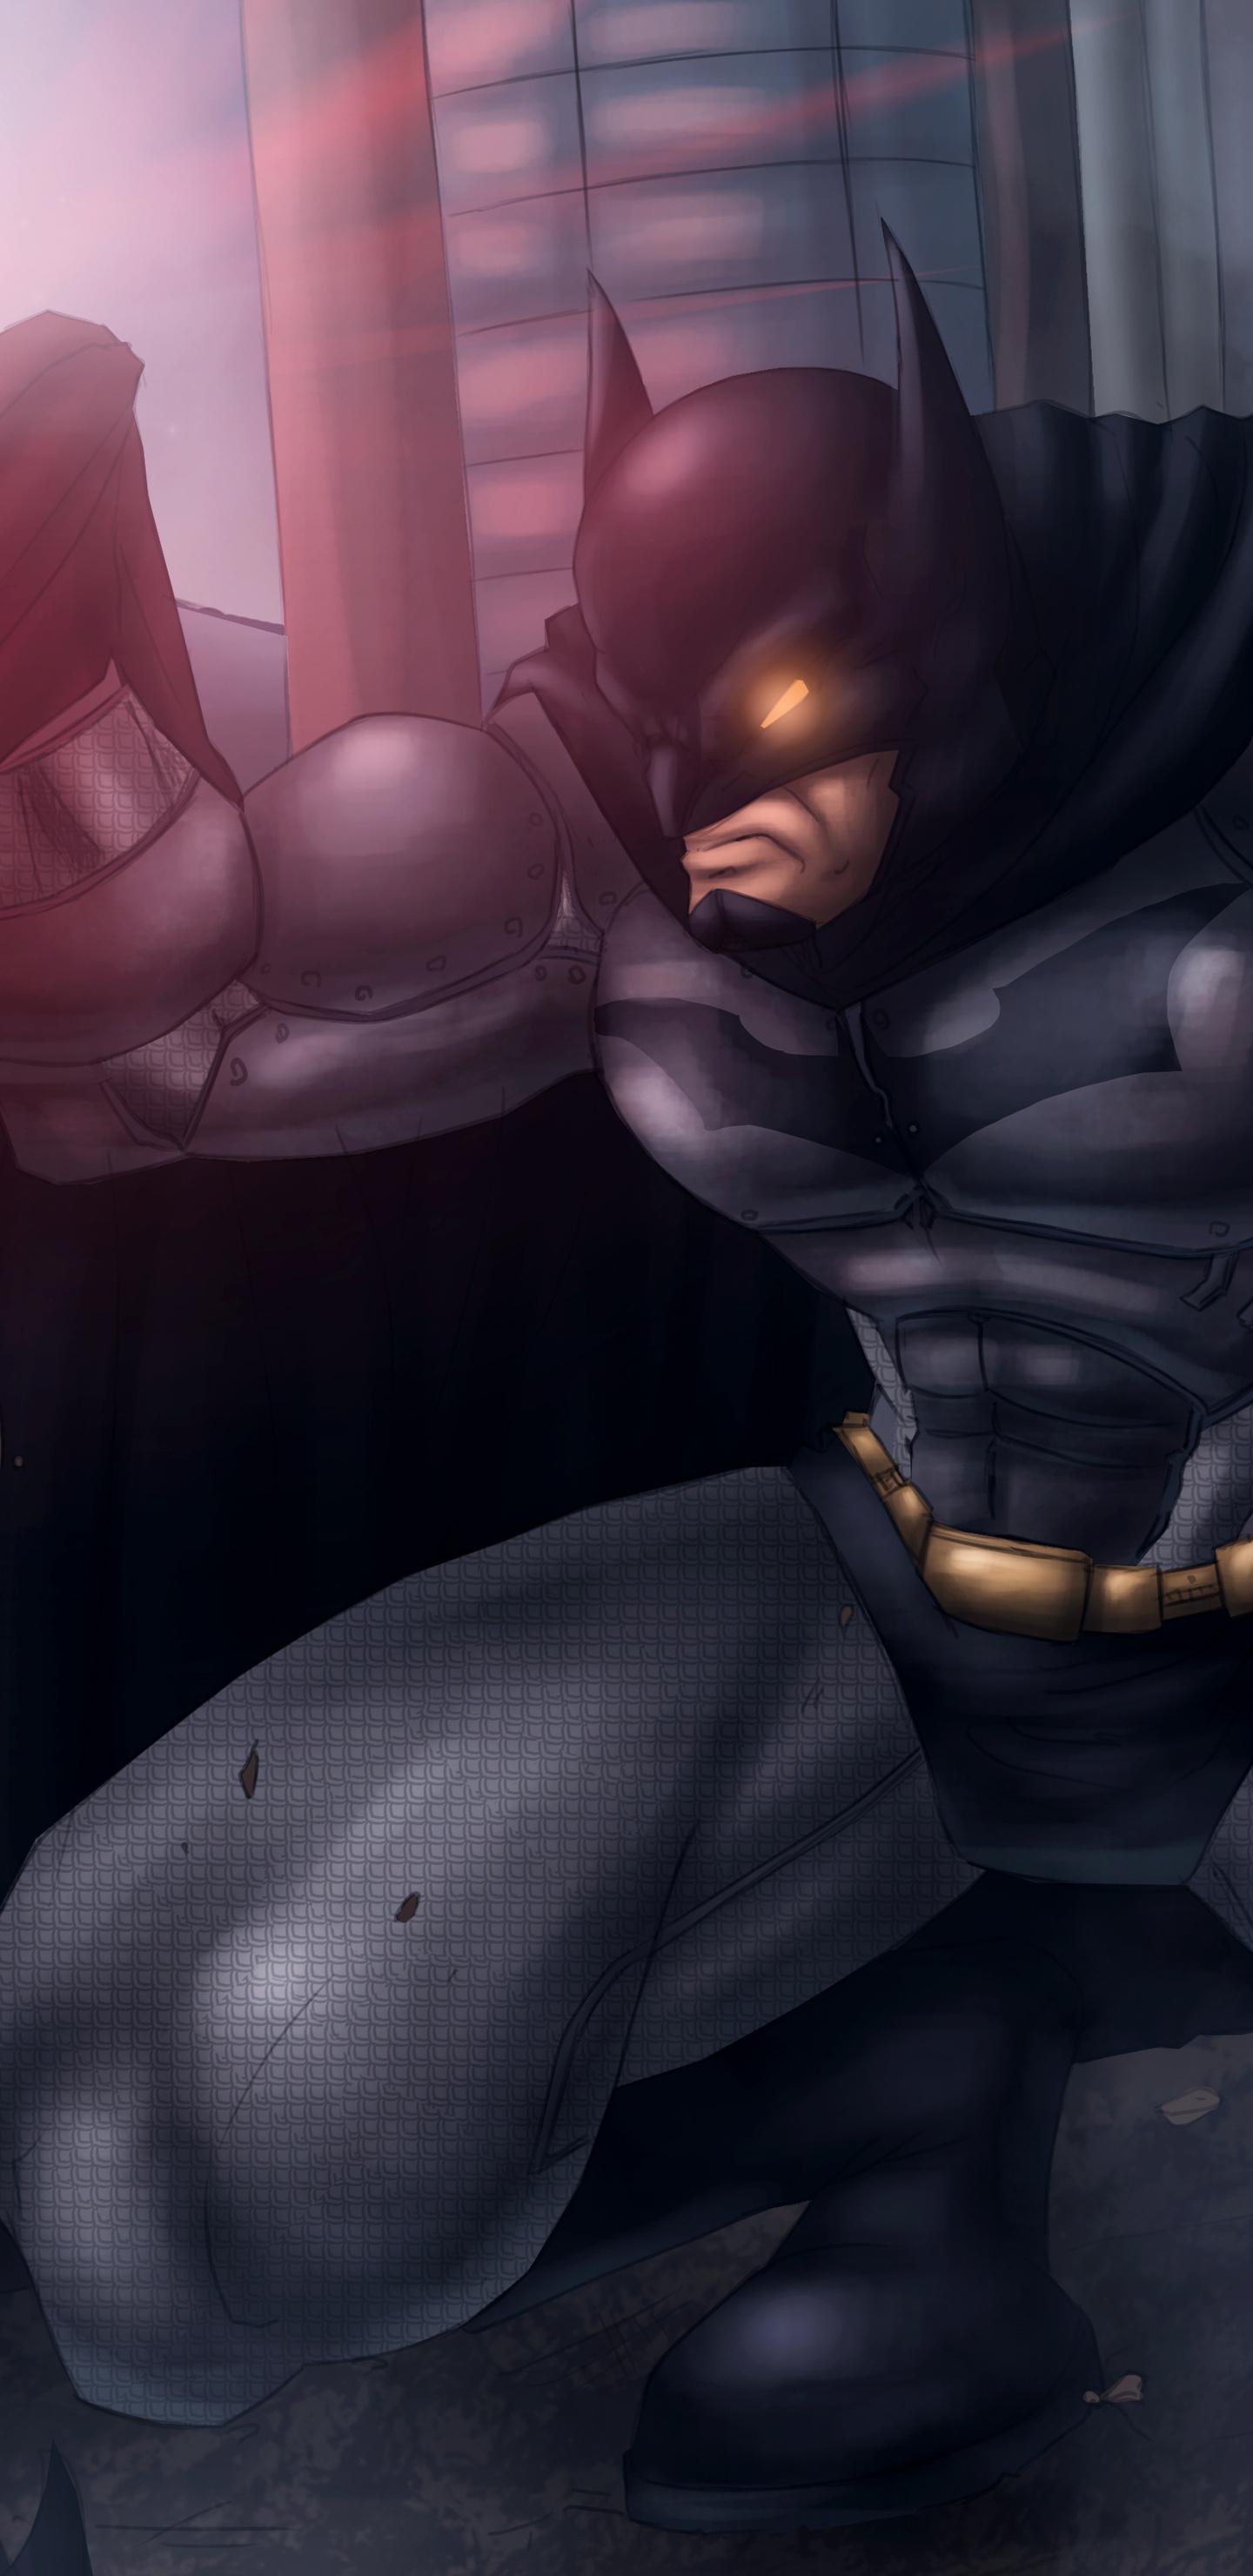 batman-vs-superman-artwork-5k-xt.jpg